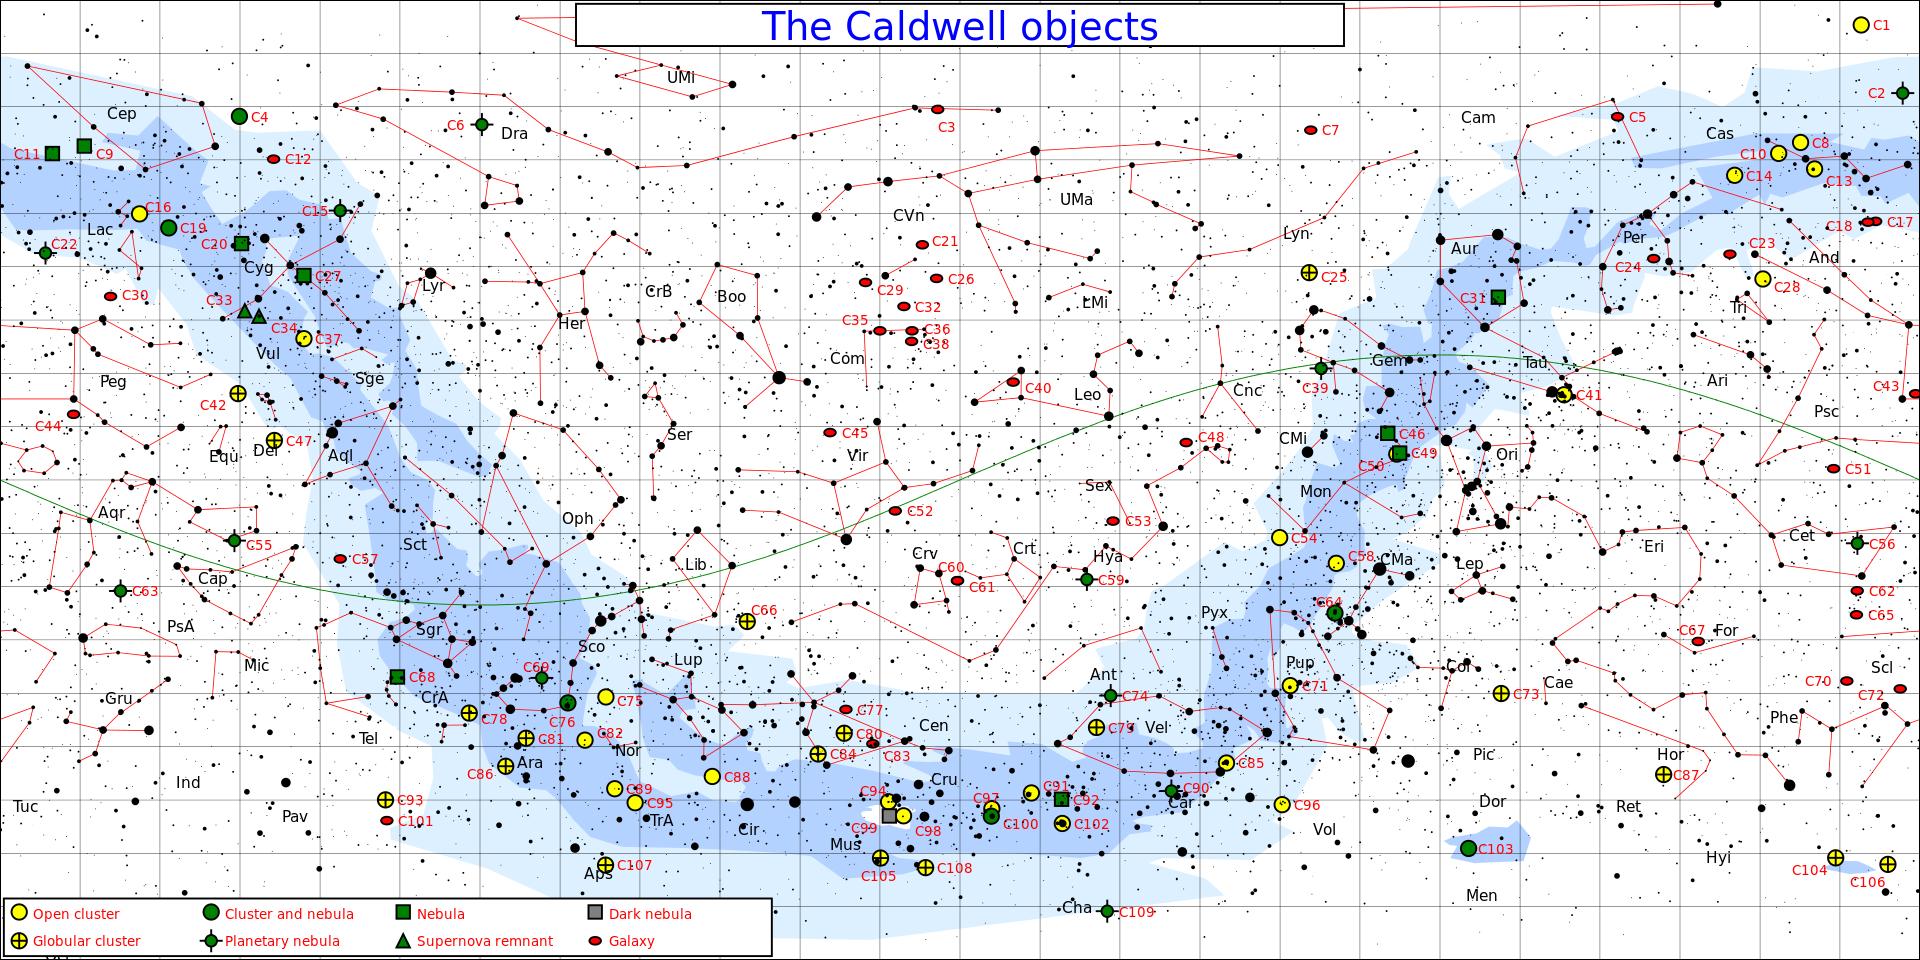 Caldwell chart by Jim Cornmell